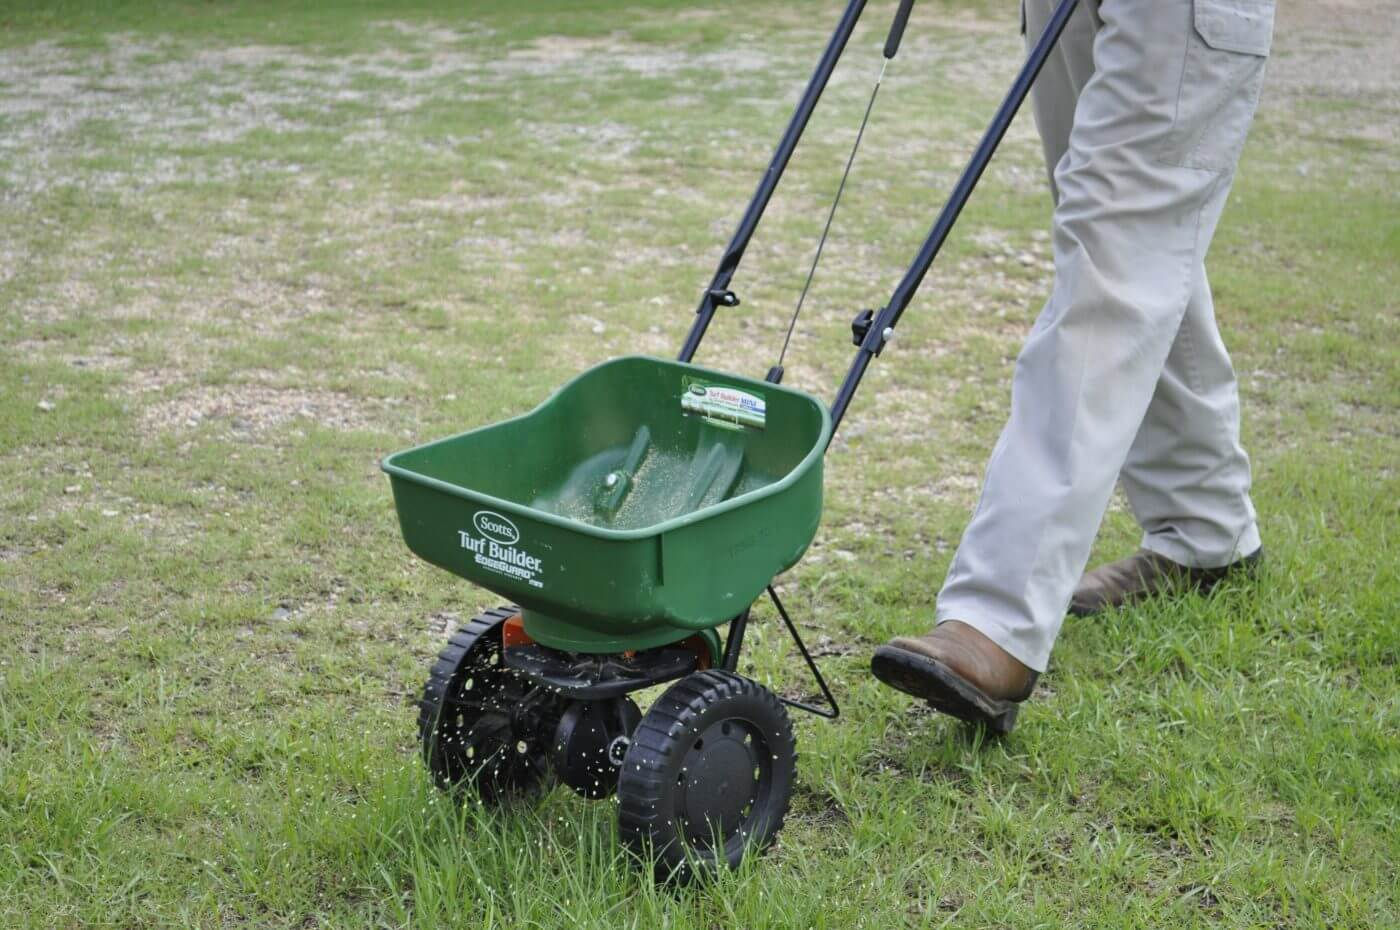 Bug House Monroe pest control employee seeding grass